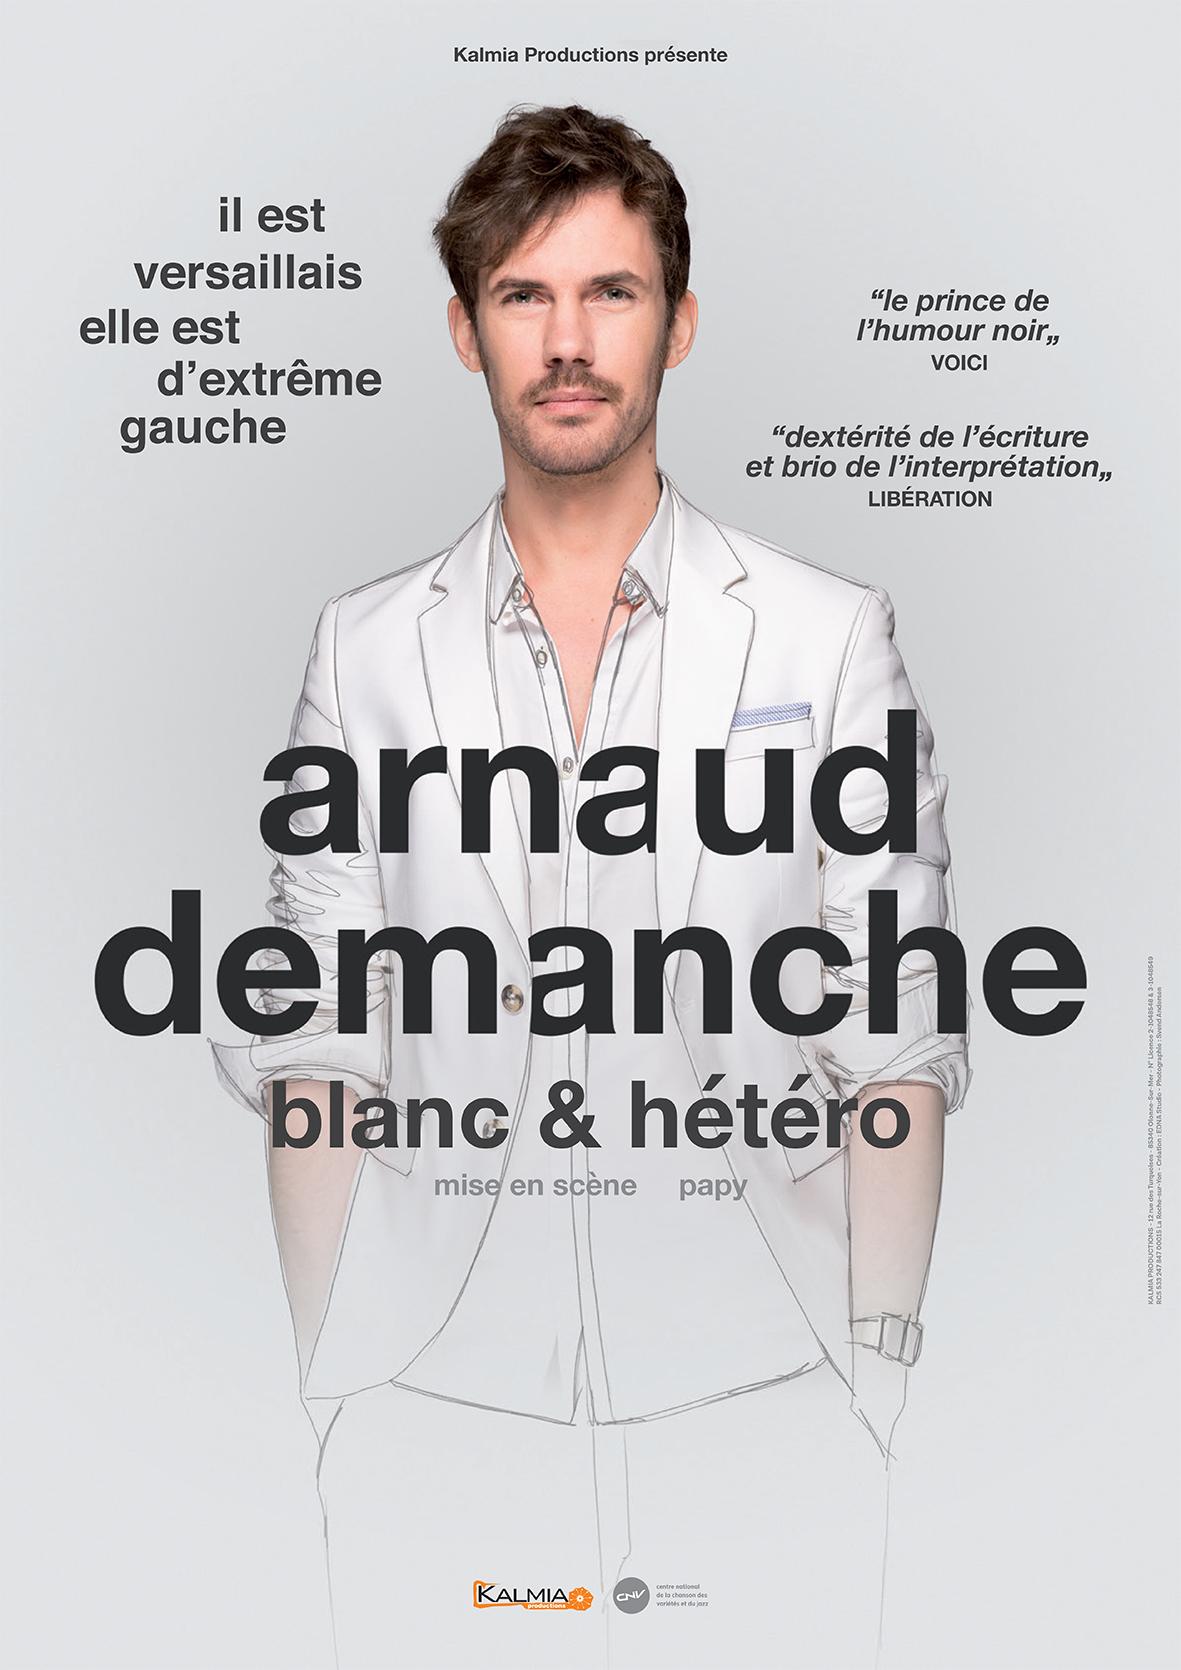 2020 Demanche Affiche Tournée Arnaud Demanche